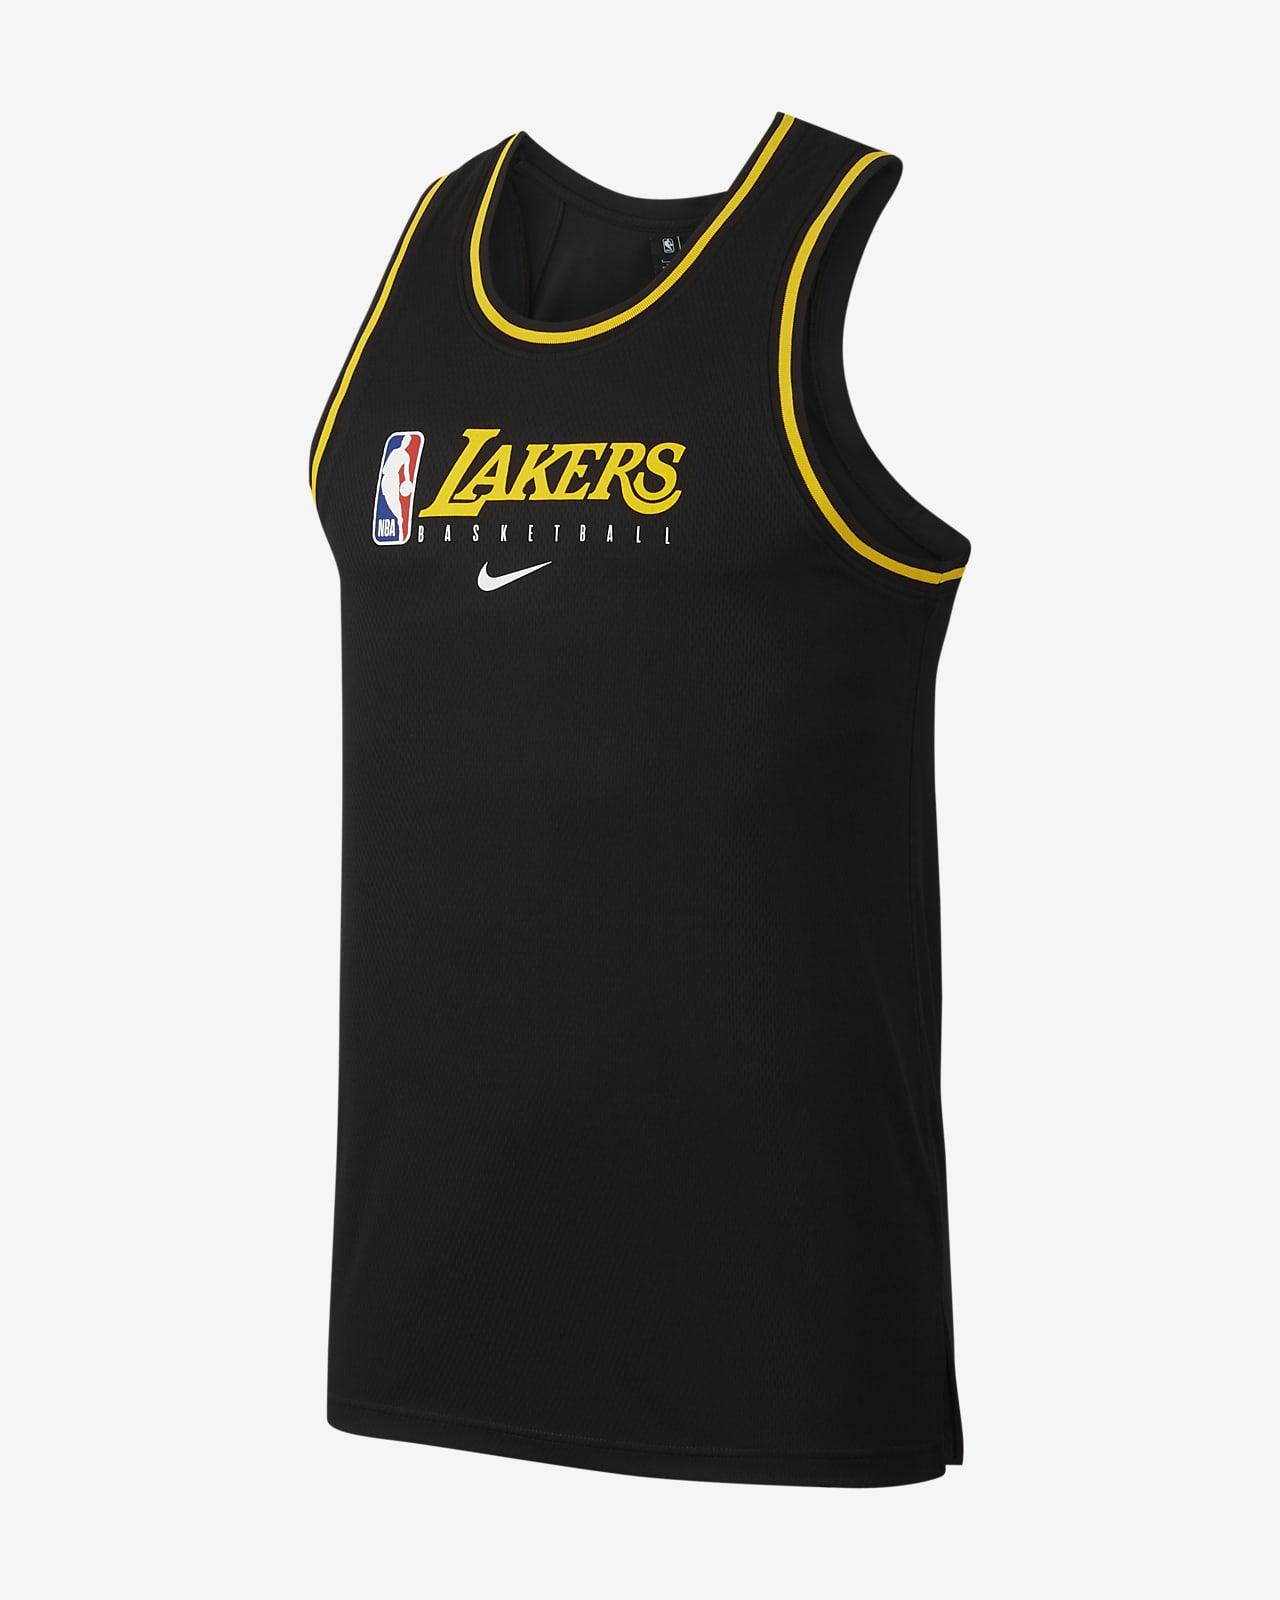 Los Angeles Lakers DNA Men's Nike Dri-FIT NBA Tank